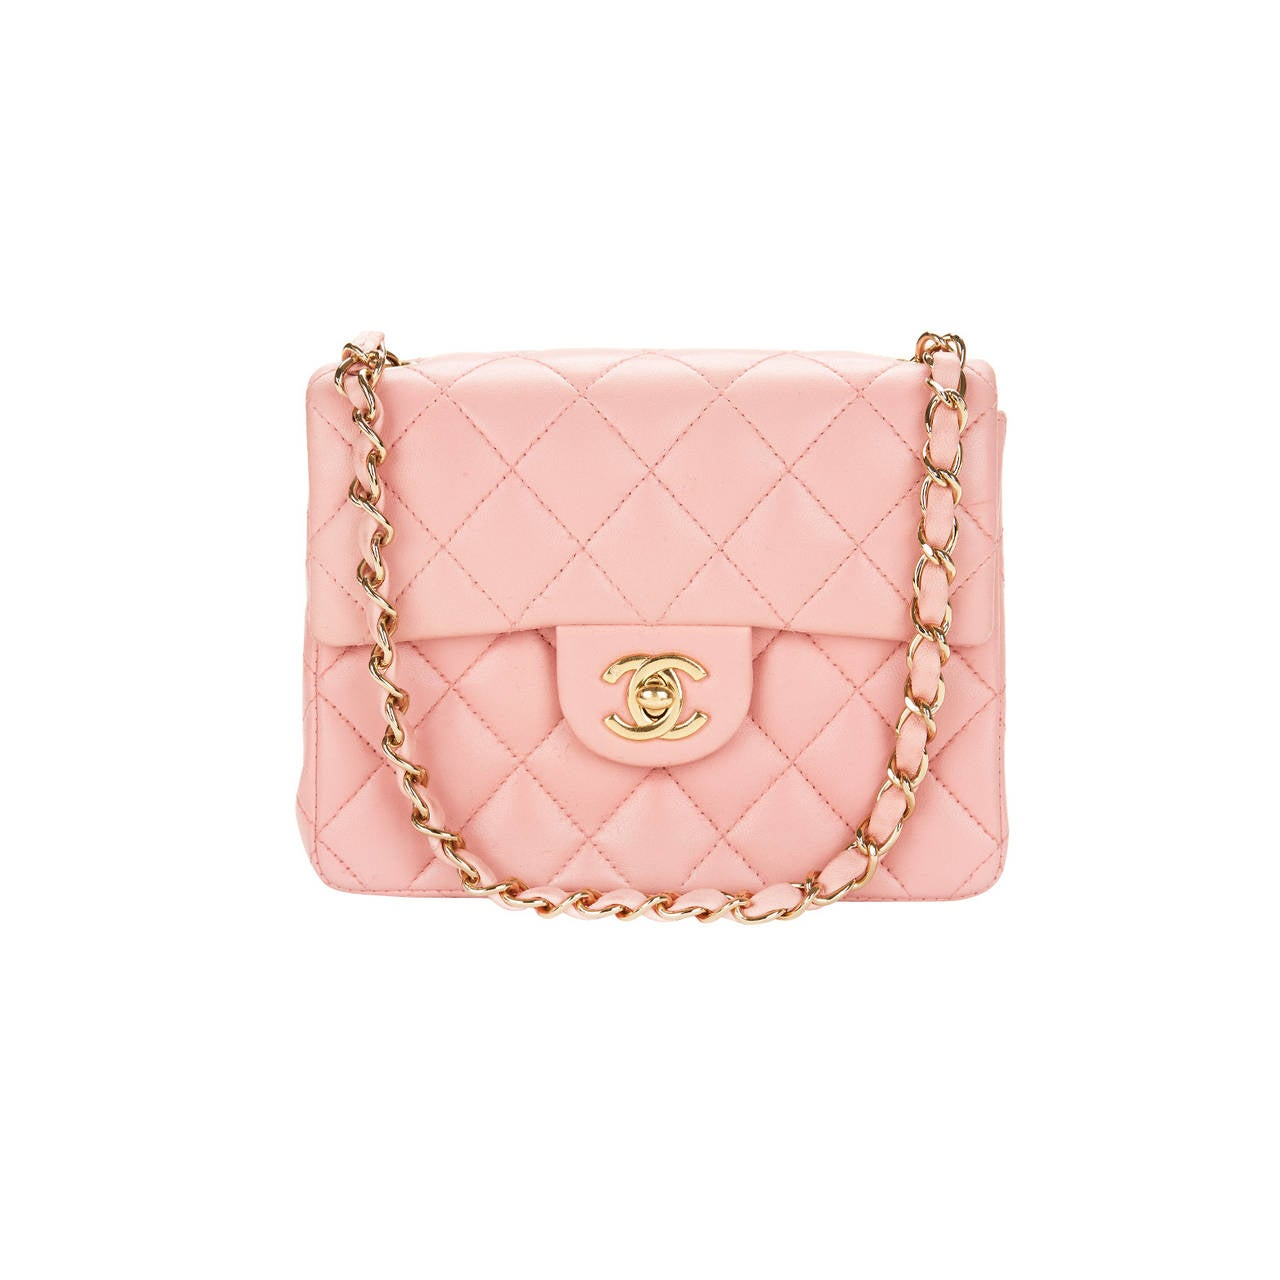 1990s Chanel Pink Lambskin Vintage Mini Flap Bag 1